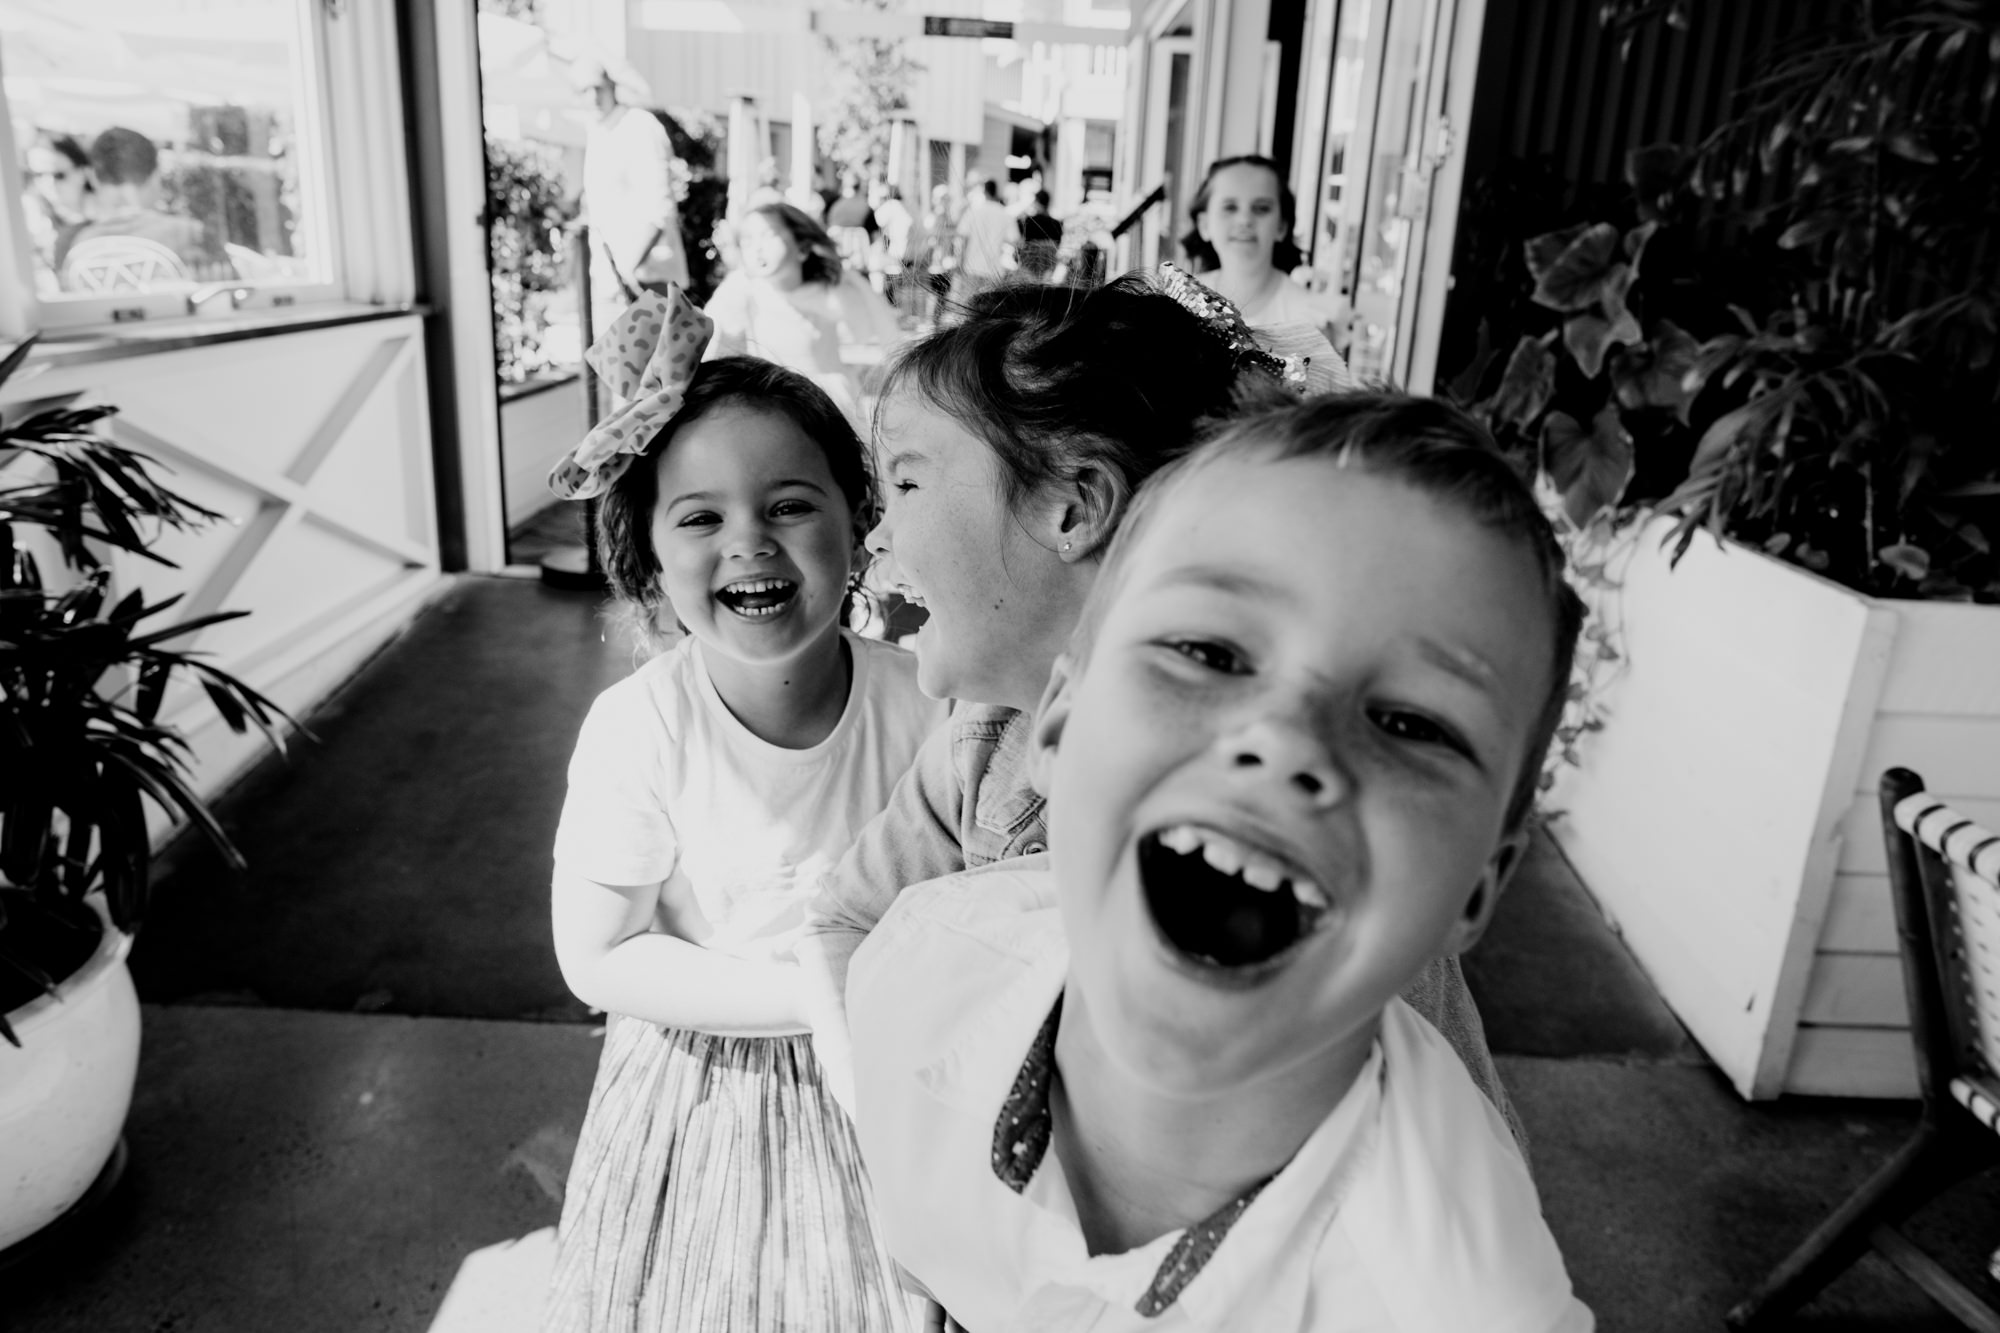 Vanessa_and_Josh_Morgan_Roberts_1983.jpg